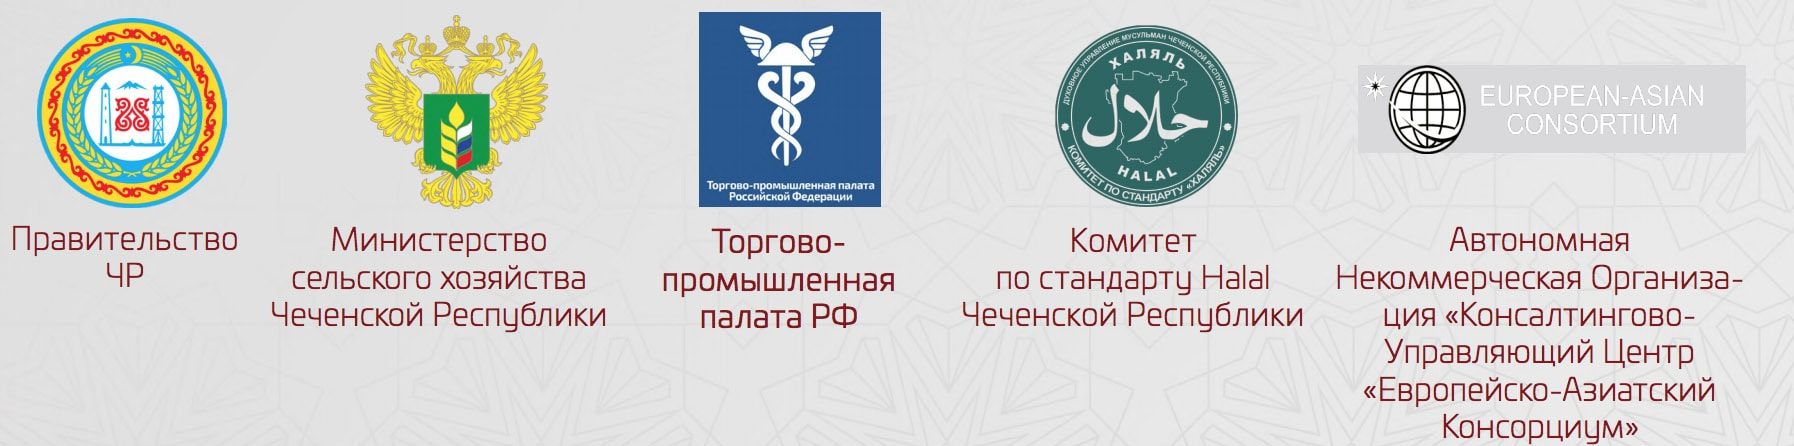 «Russian Halal Expo» 2019 Грозный